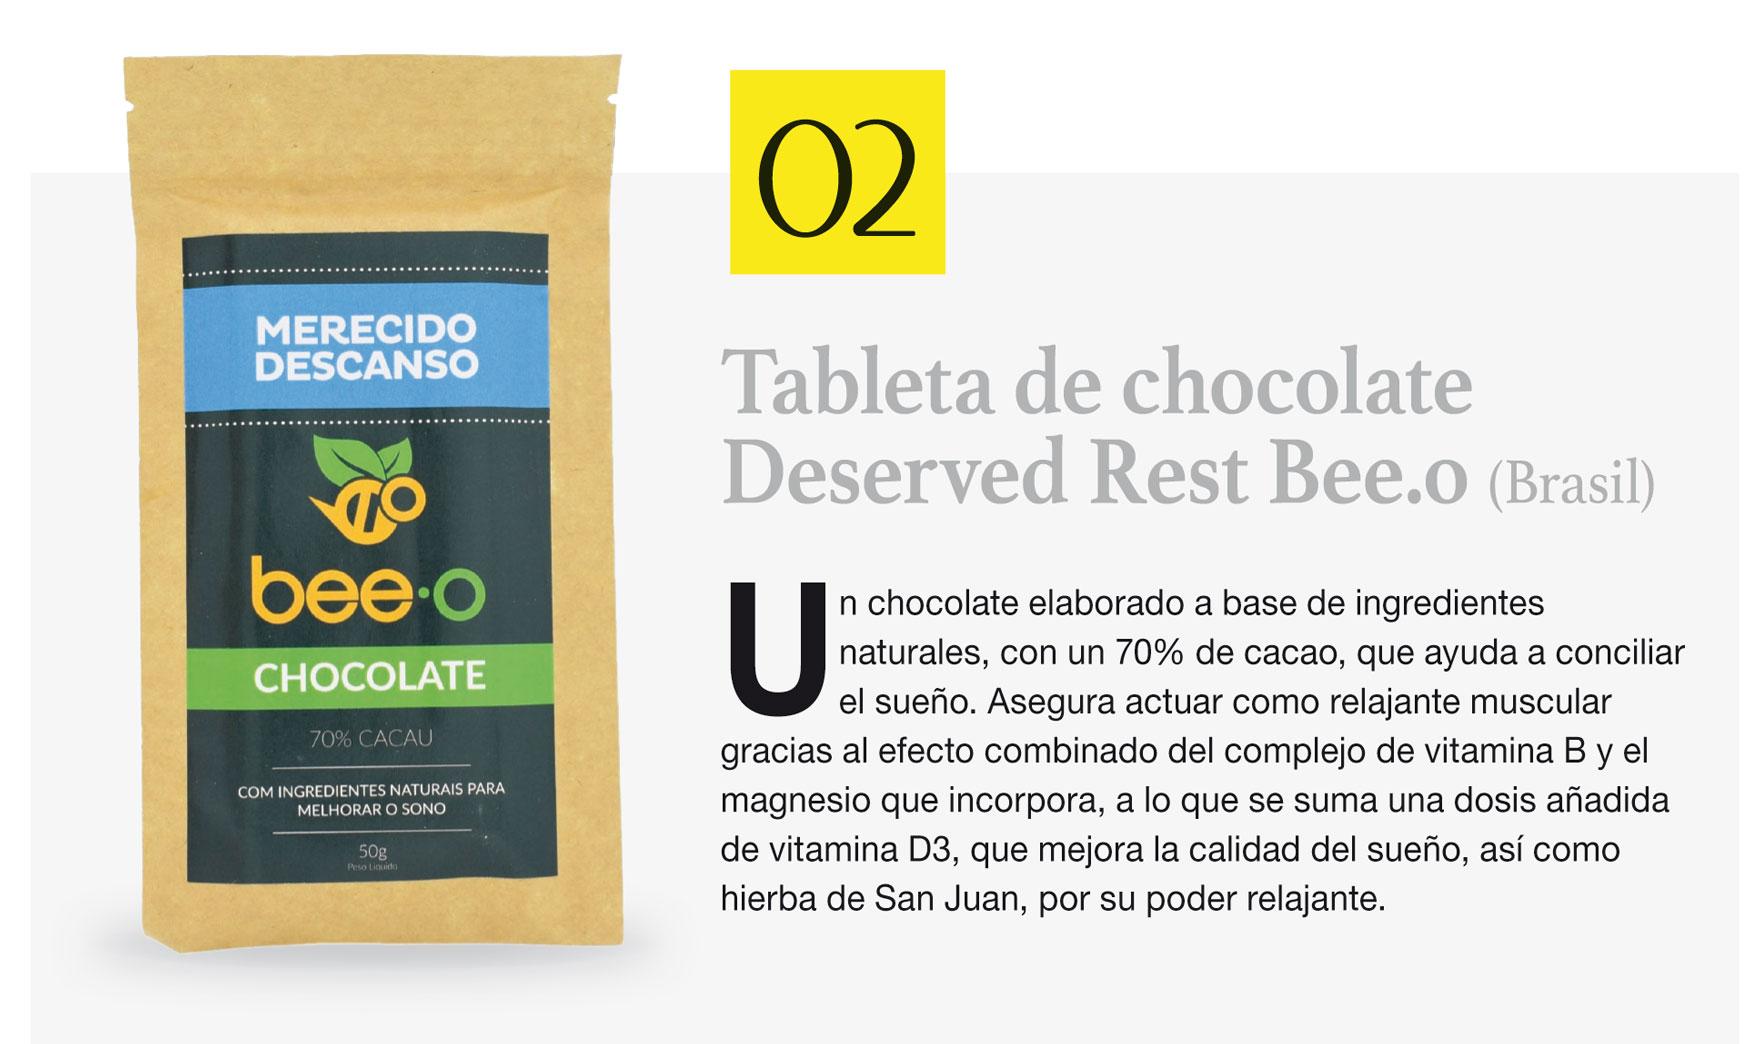 Tableta de chocolate Deserved Rest Bee.o (Brasil)